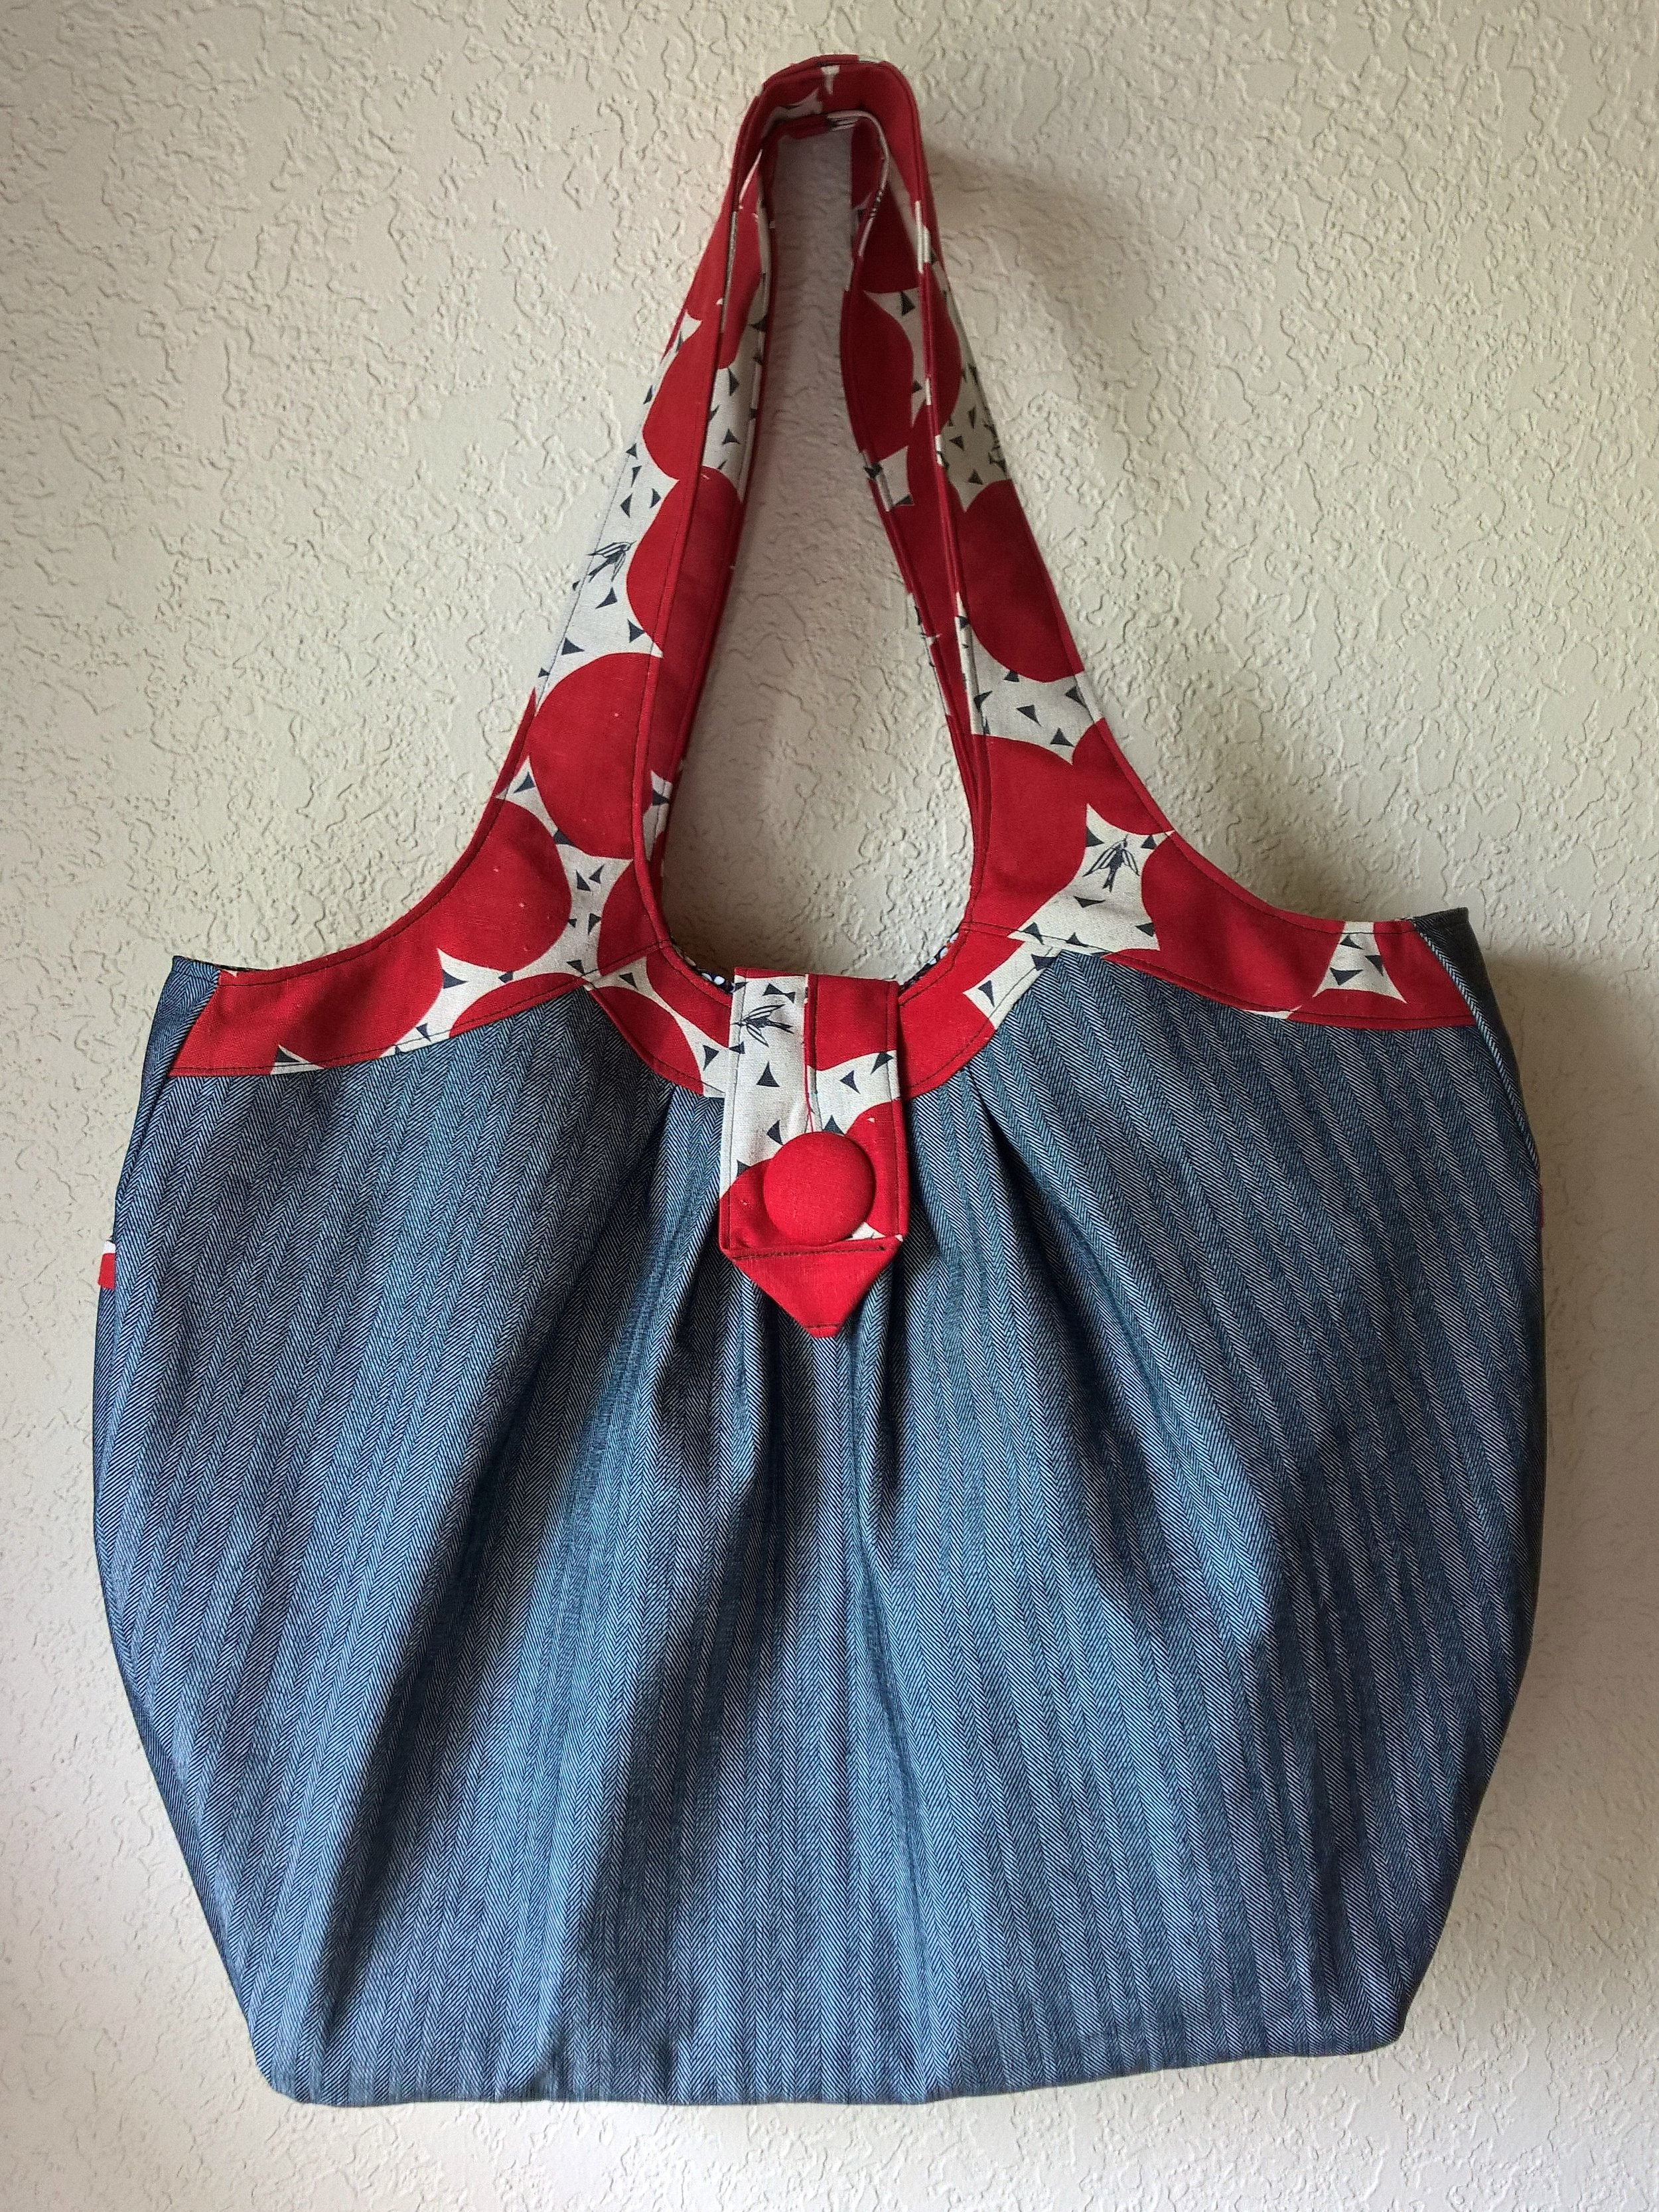 My ultimate mom-bag